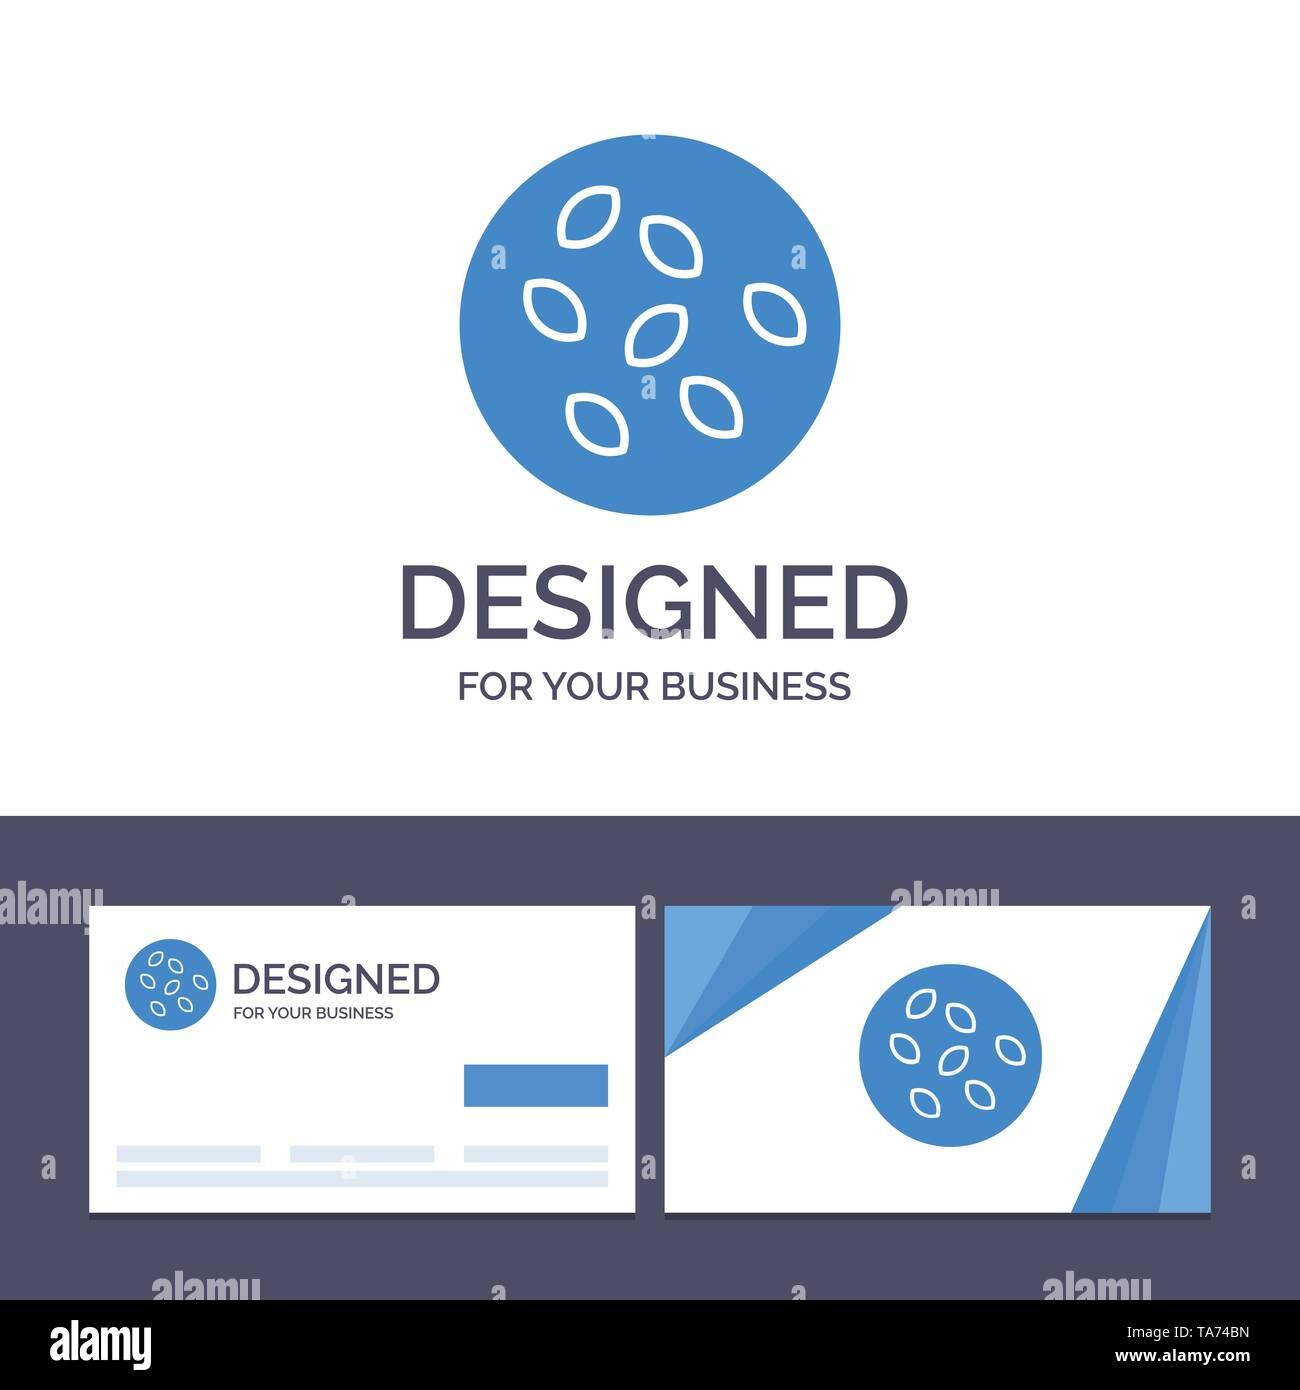 Creative Business Card and Logo template Seeds, Sesame, Sesame Seeds, Seamus Vector Illustration - Stock Image